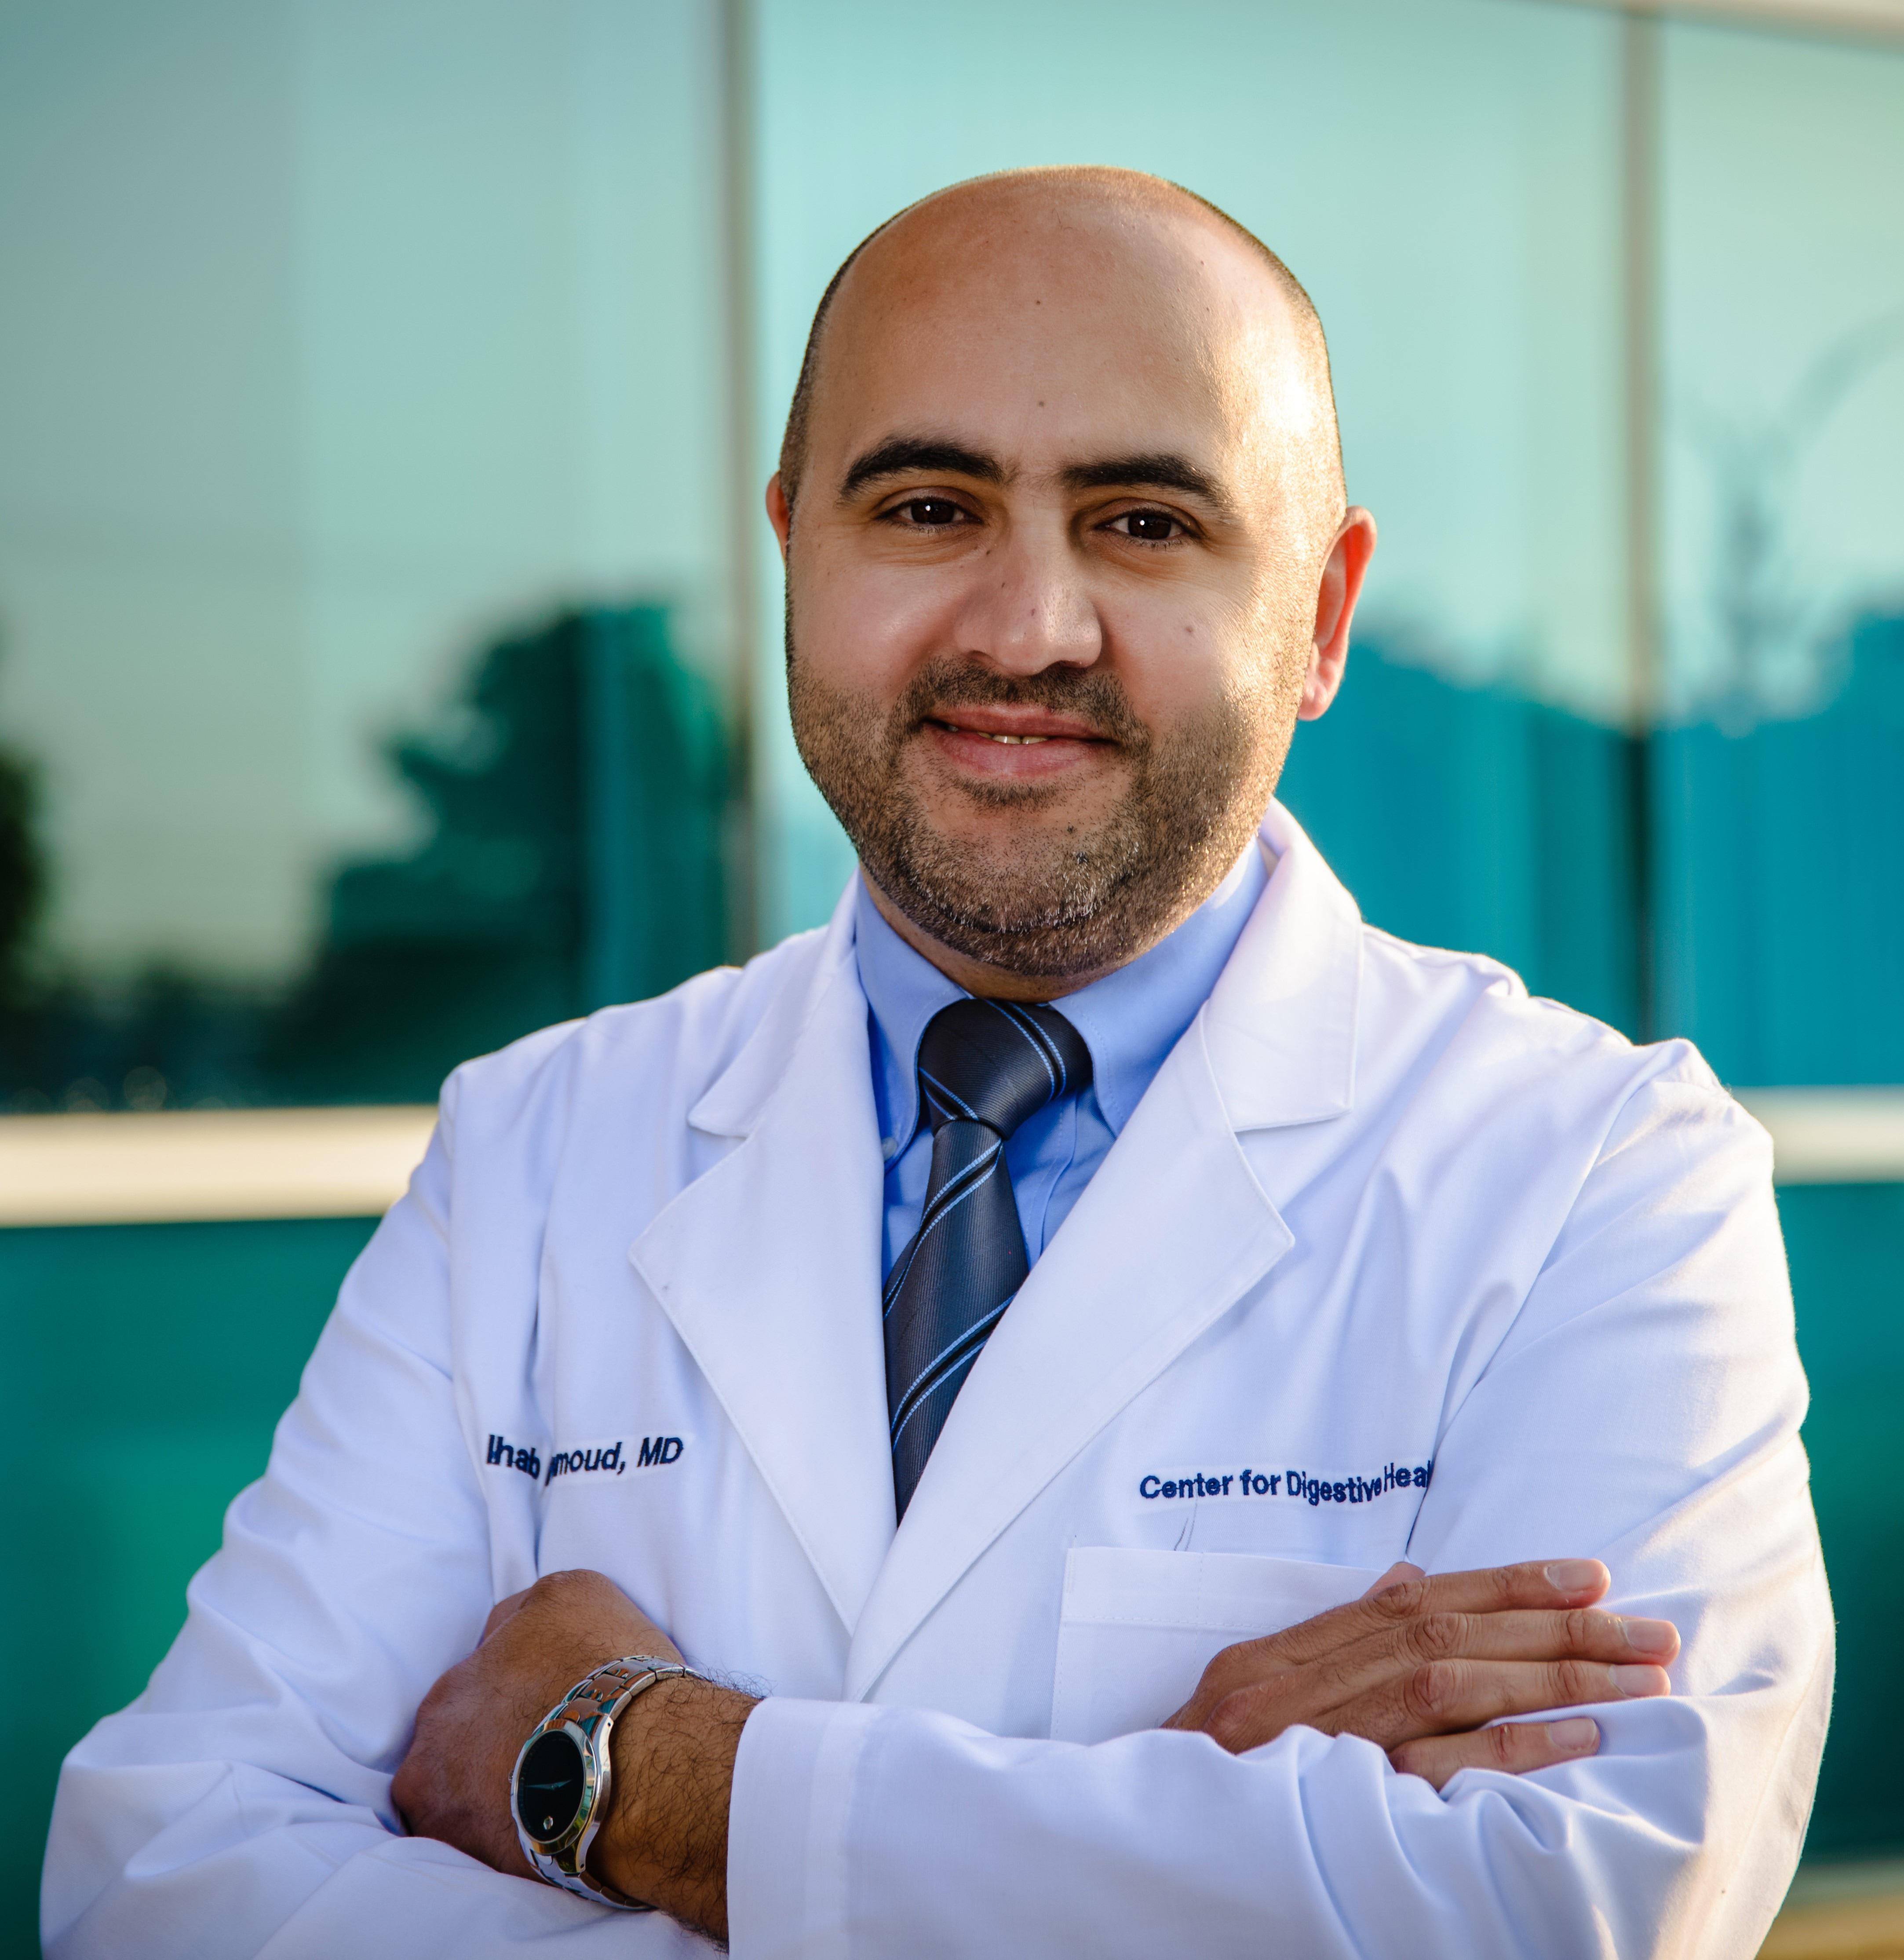 Dr. Ihab O Hammoud MD